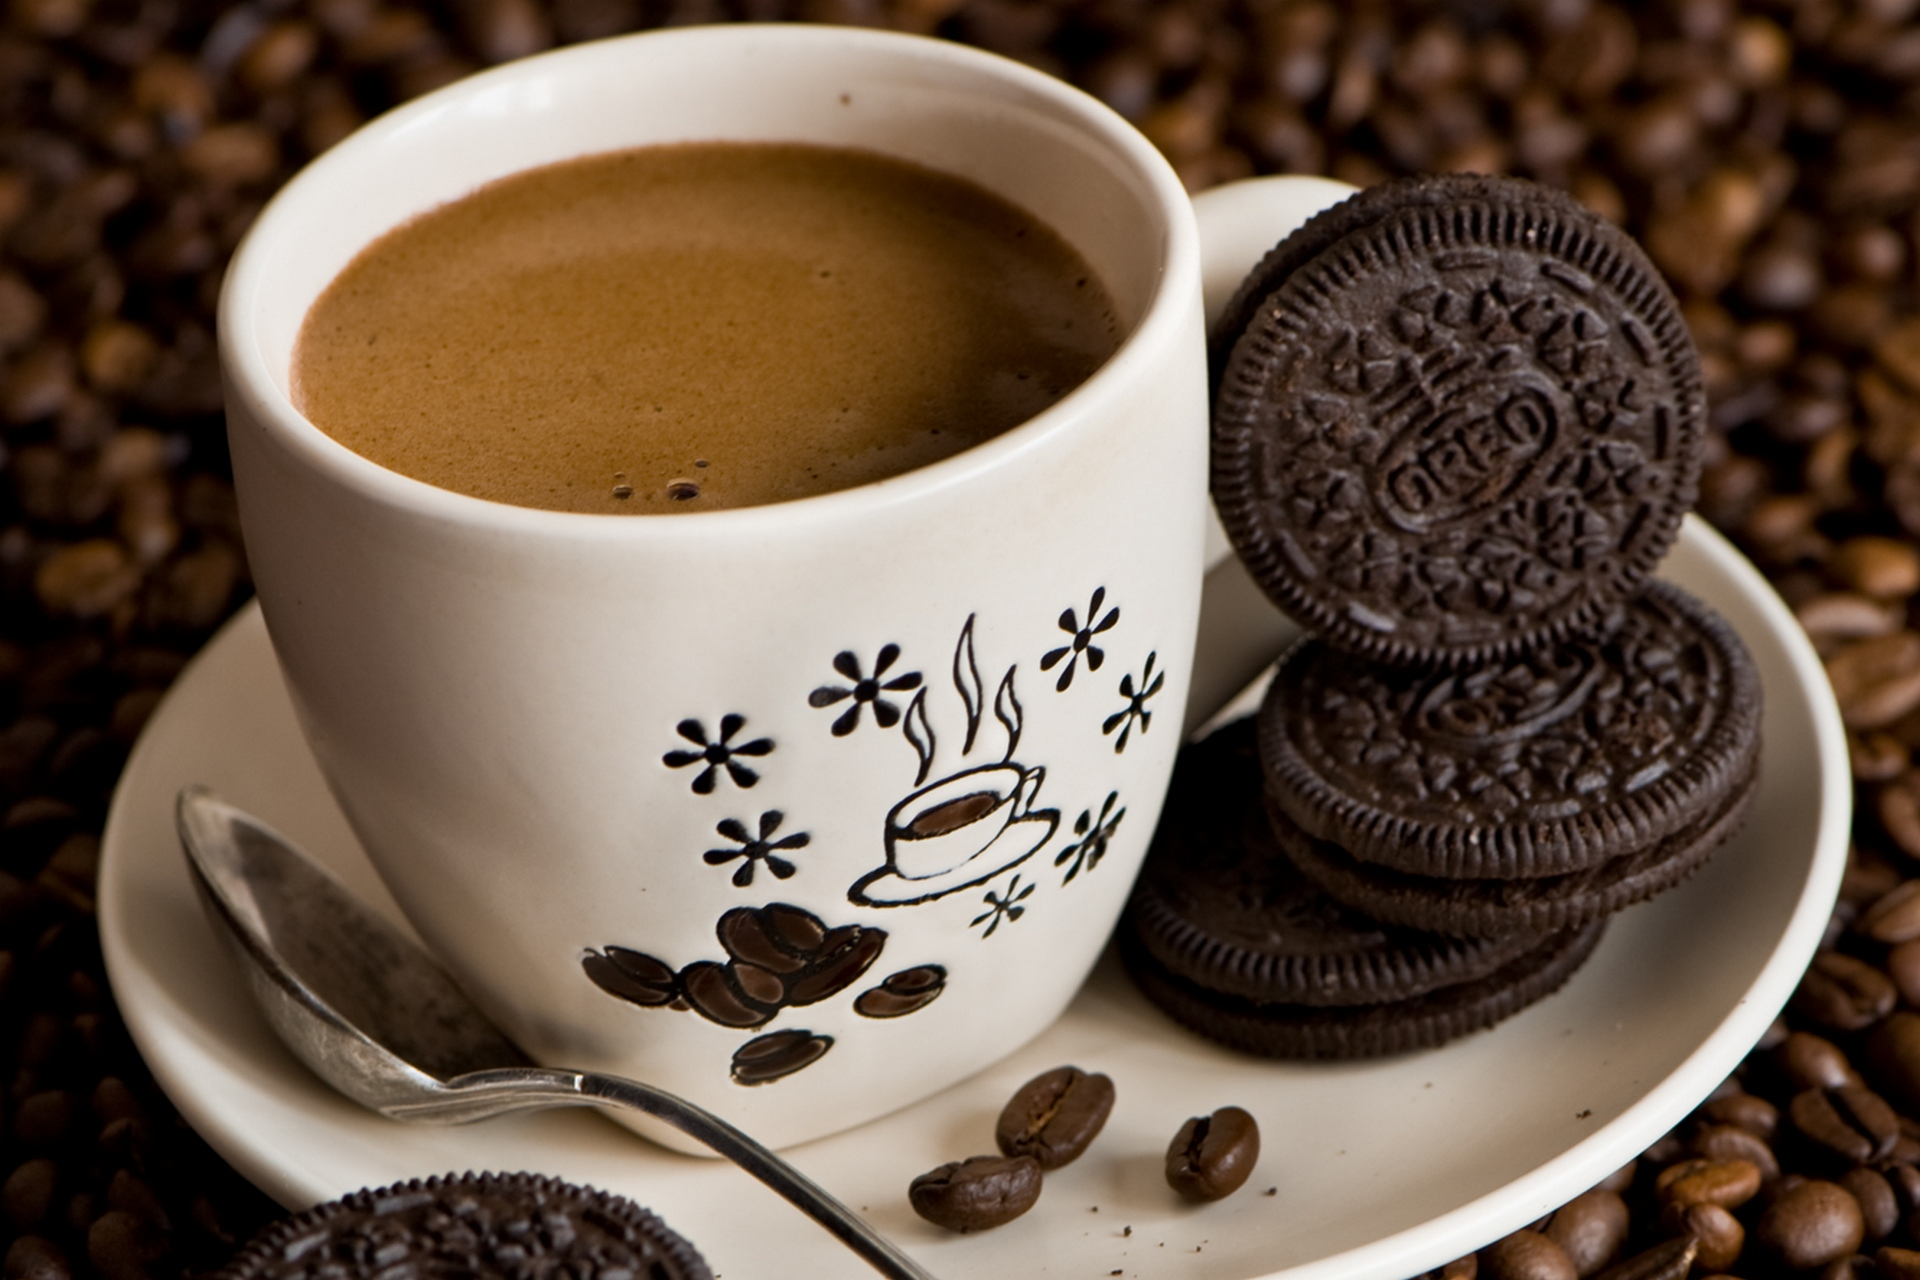 звоните, чашечка ароматного кофе картинки назвала